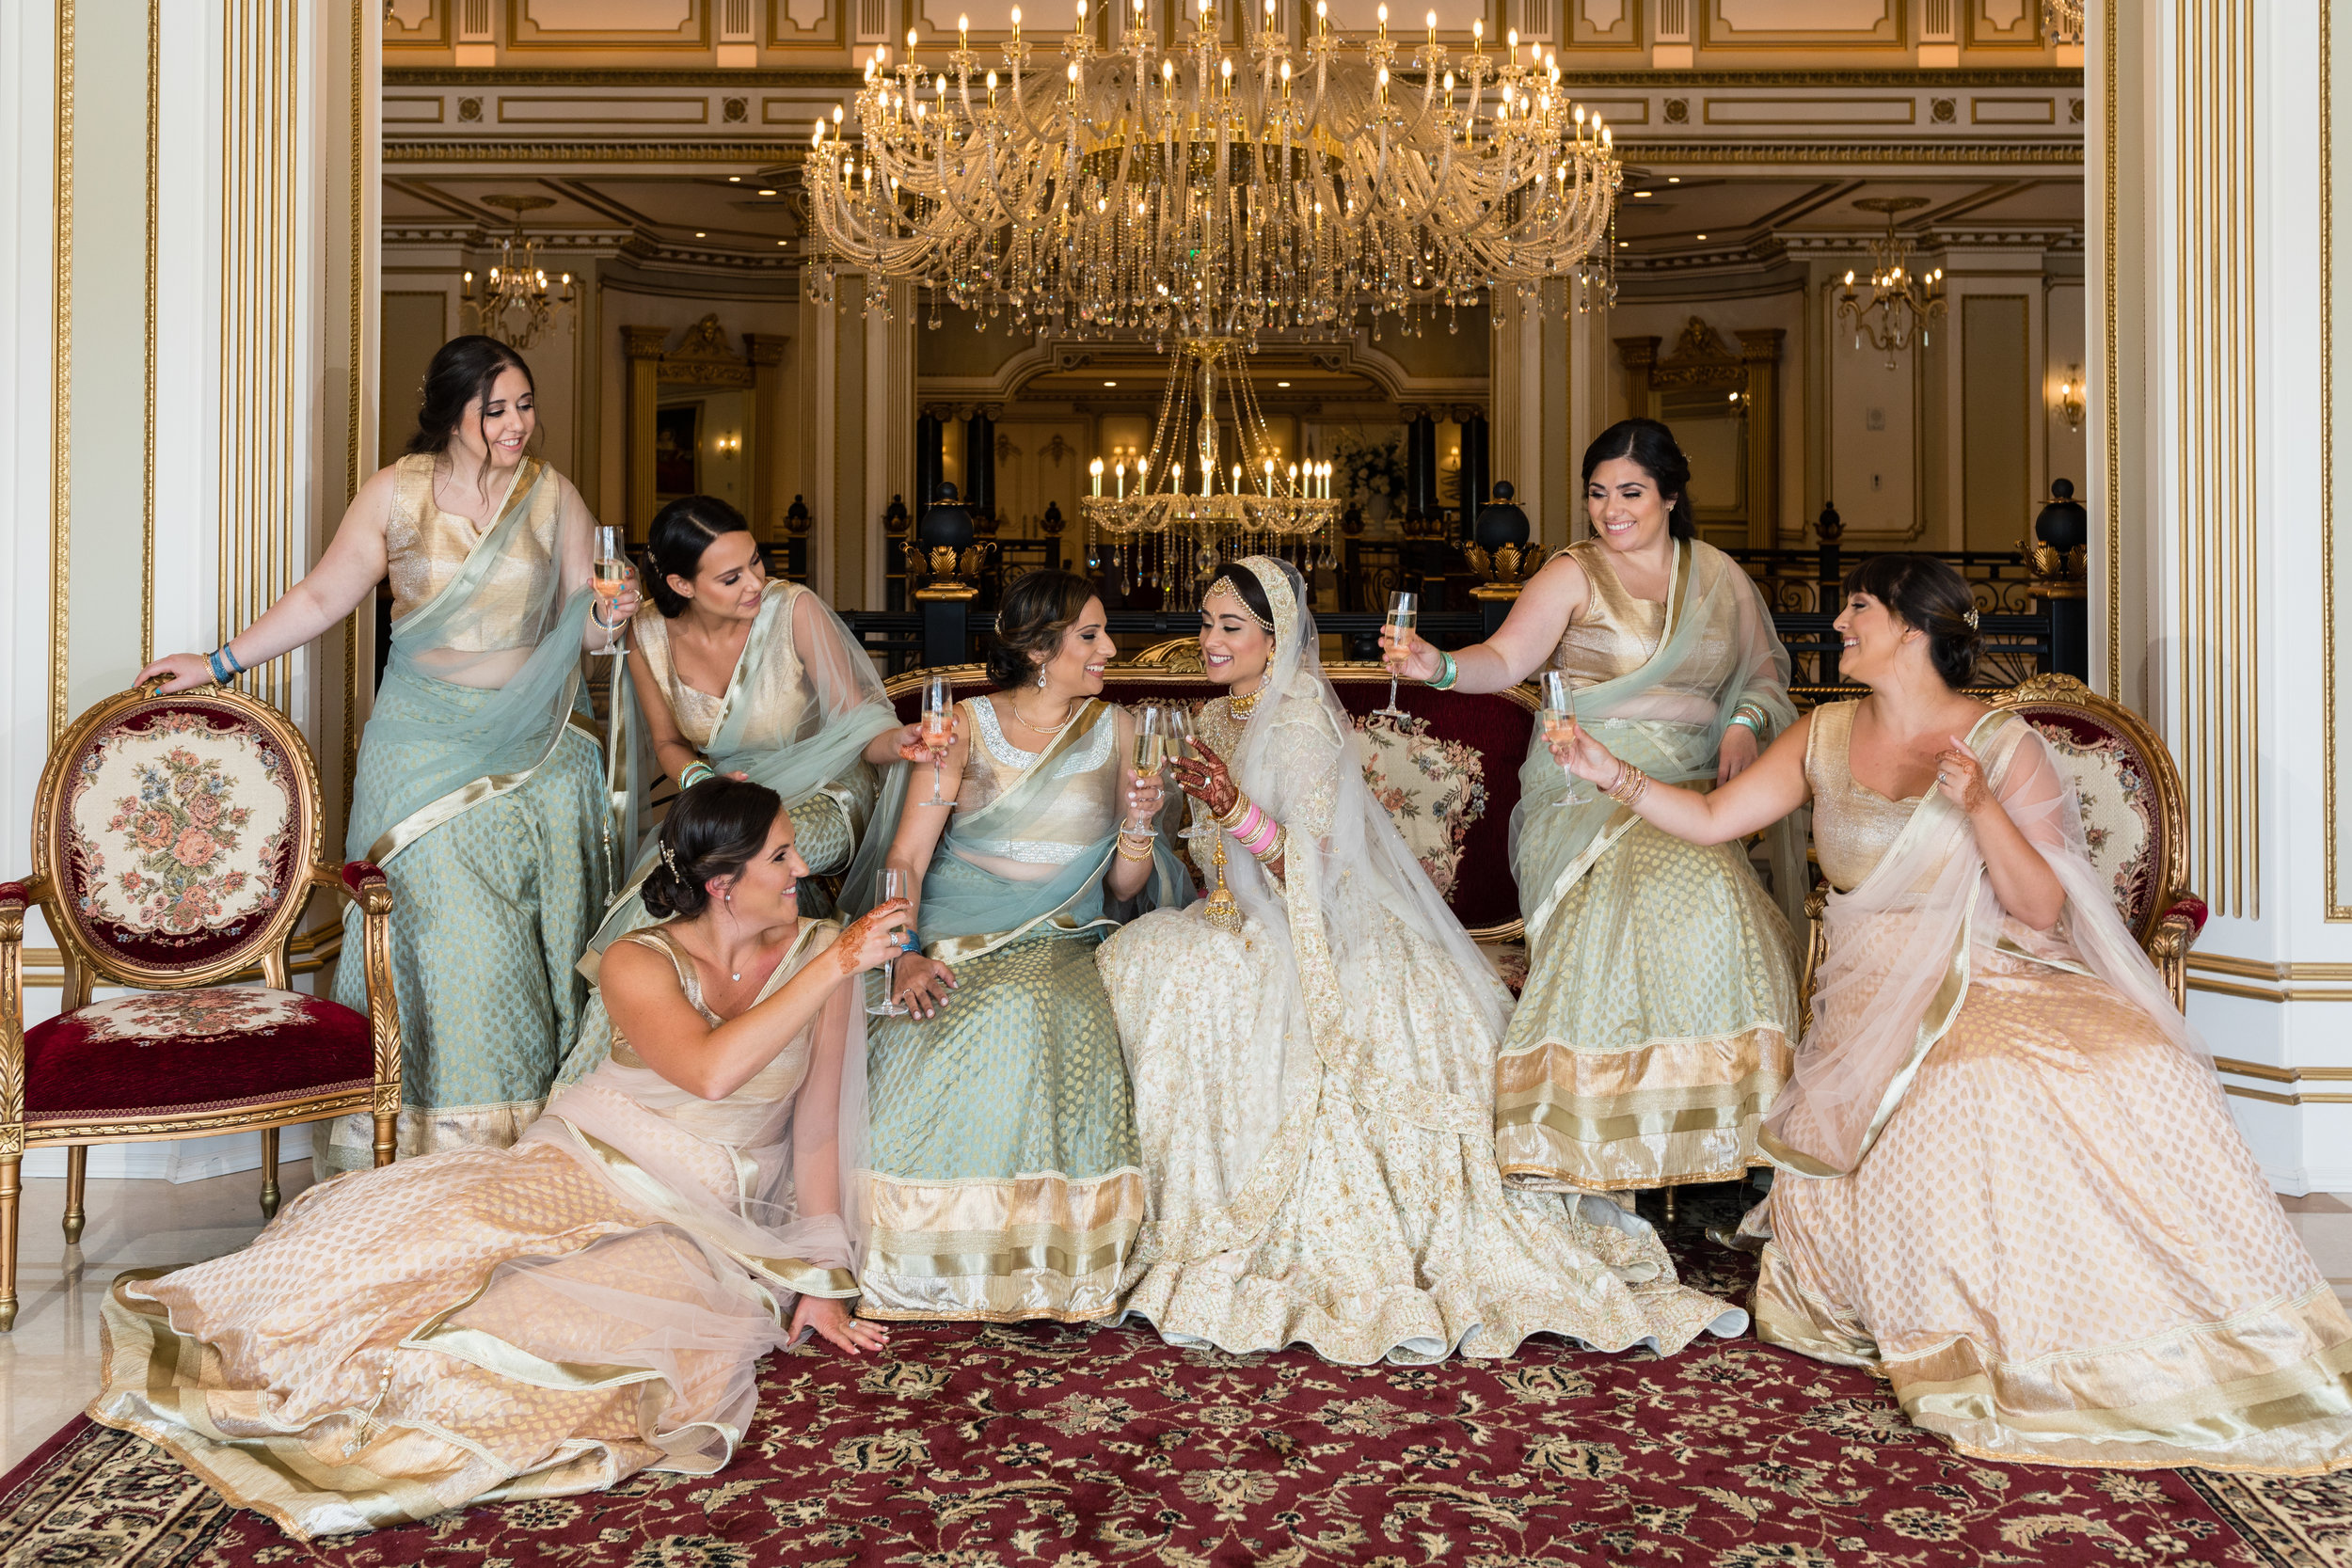 INDIAN WEDDING BRIDAL PARTY.jpg